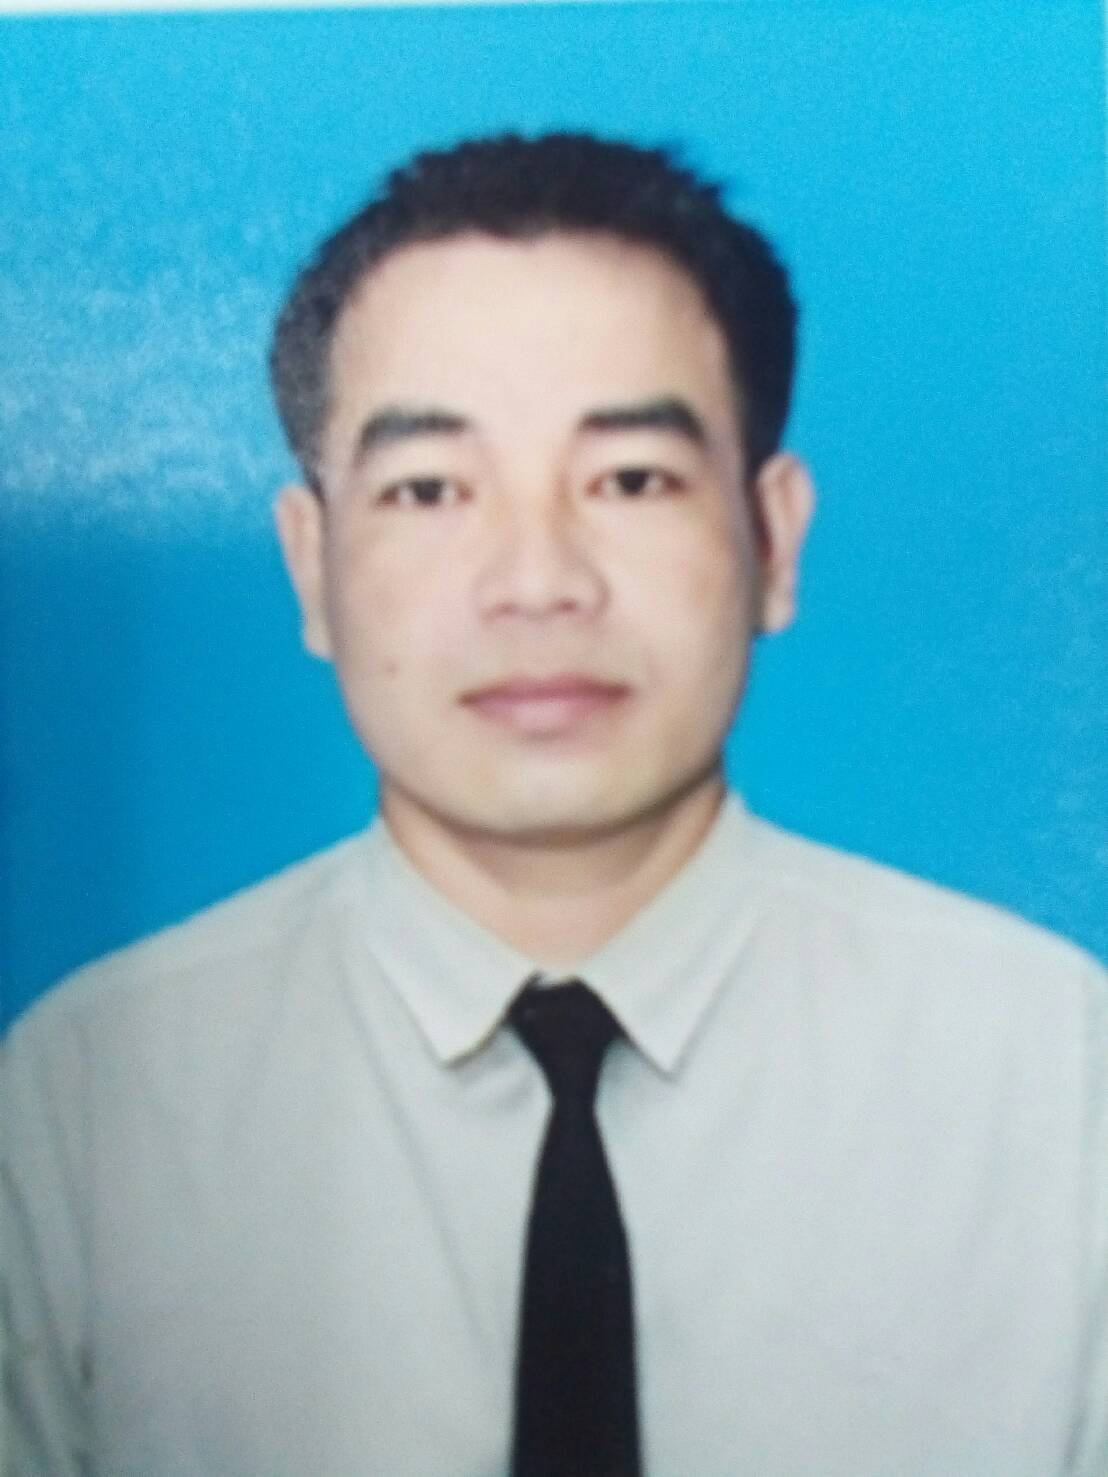 Mr. Thongchai Praseatsung